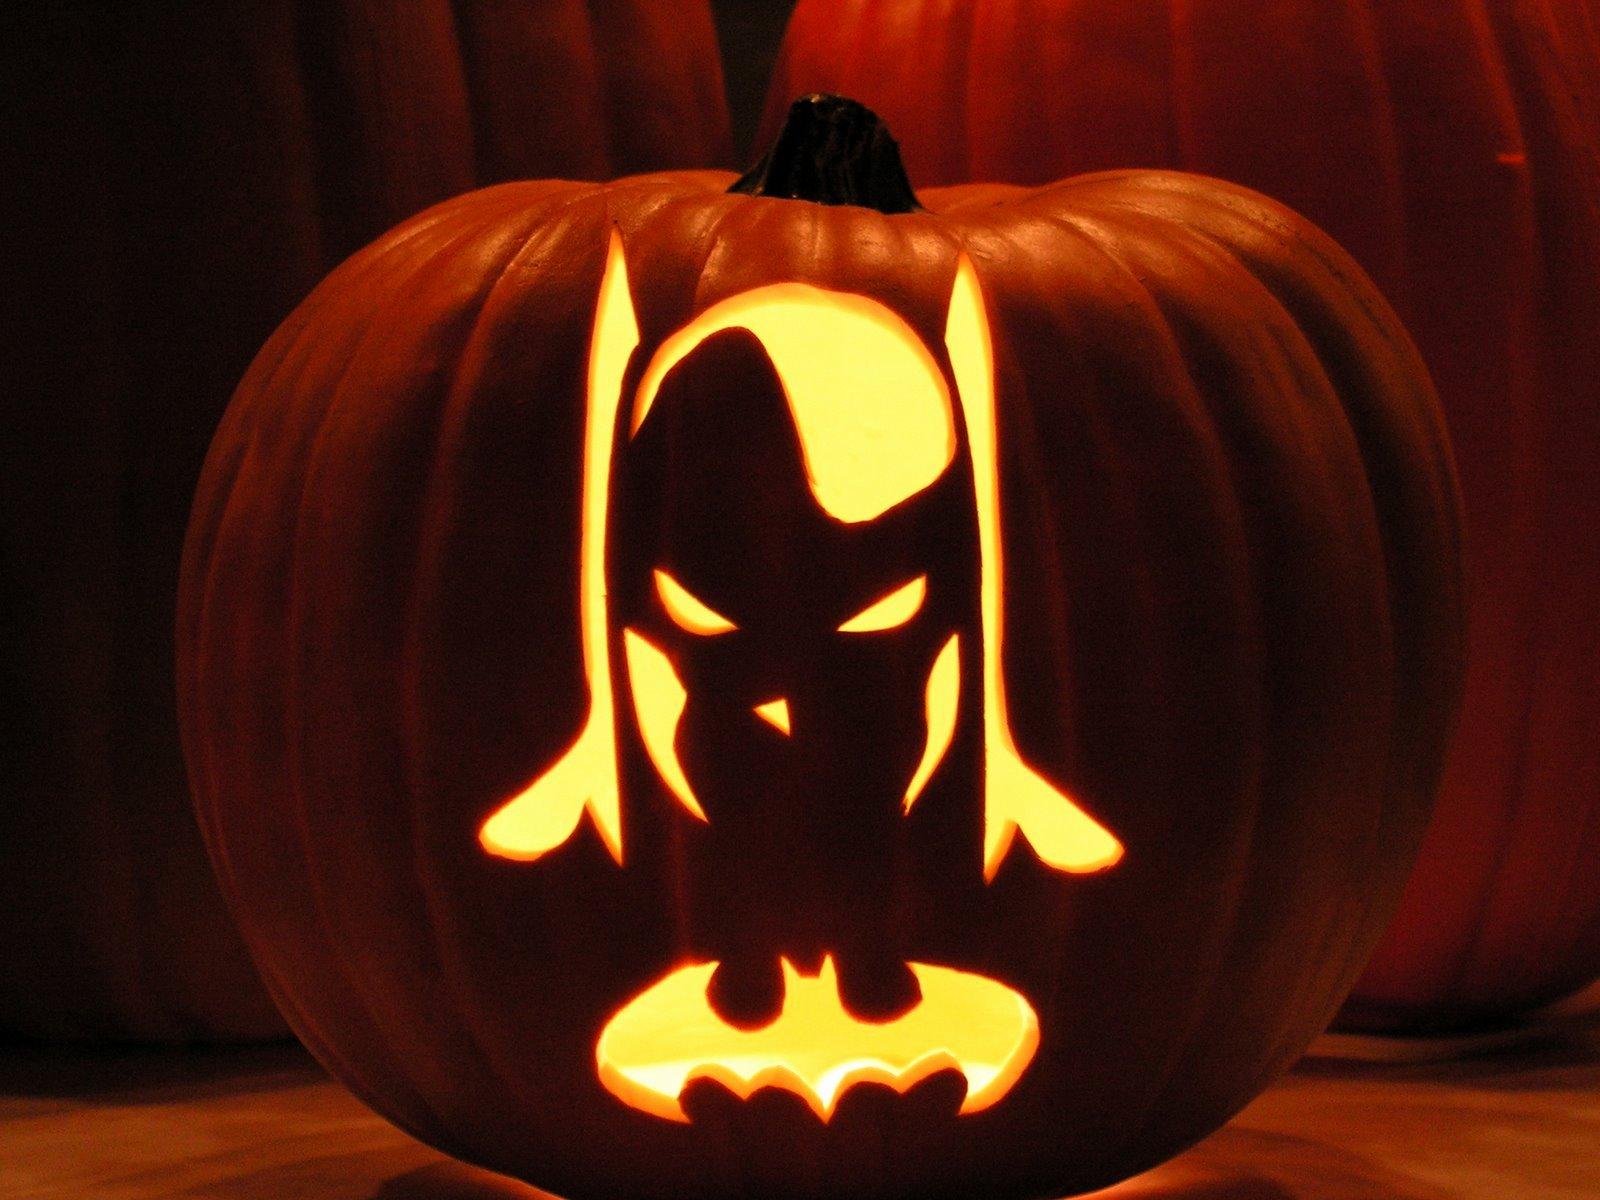 Batman Pumpkin Carving Stencils Unique the Gallifreyan Gazette Cool Jack O Lanterns